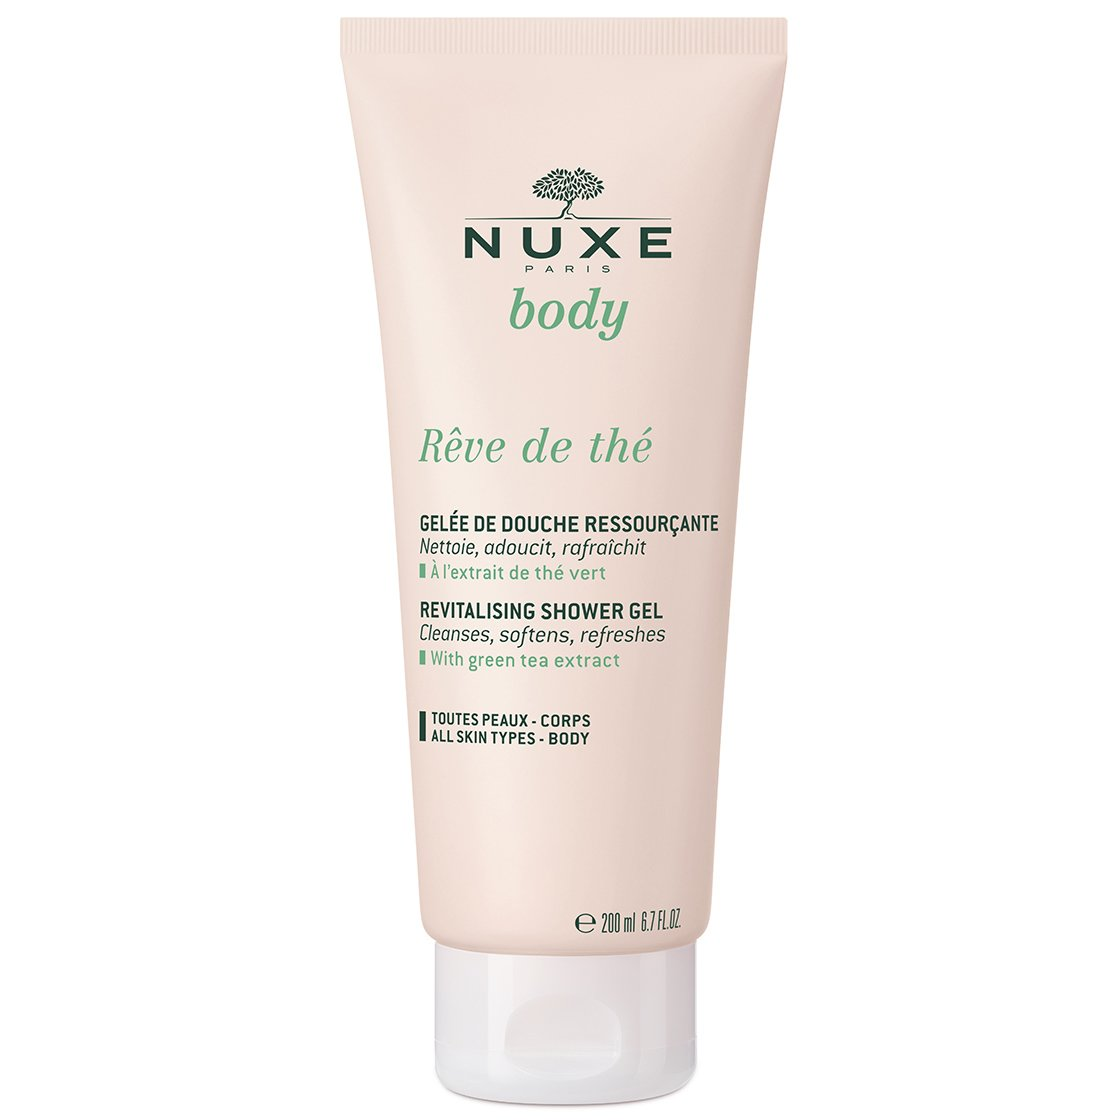 Nuxe Body Reve de The Revitalising Shower Gel Αναζωογονητικό Αφρόλουτρο Σώματος με Εκχύλισμα Πράσινου Τσαγιού 200ml